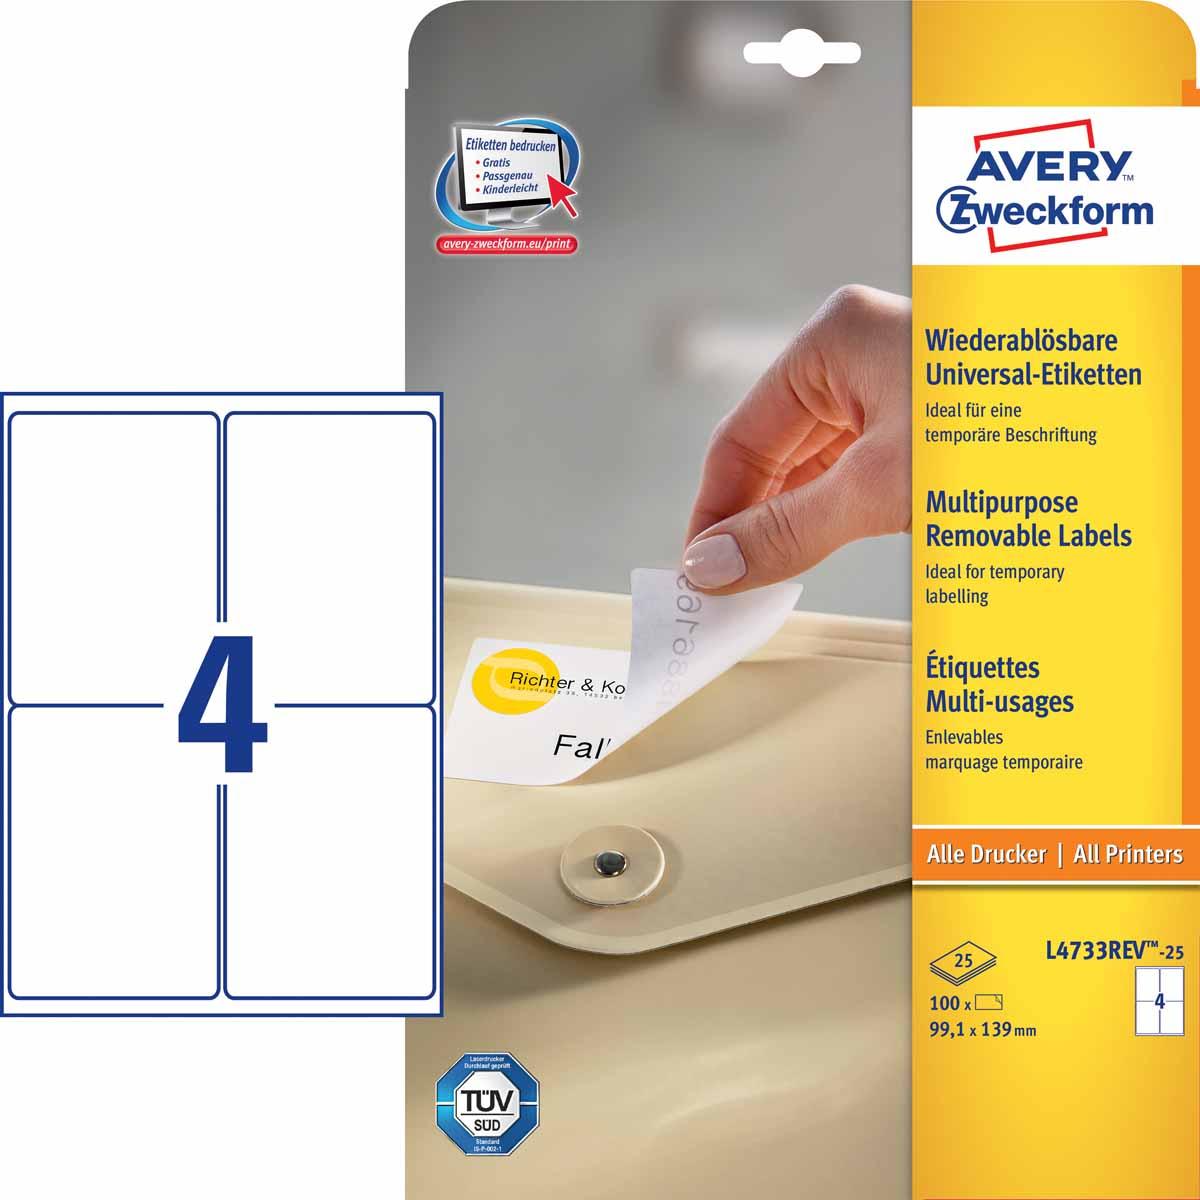 Avery Zweckform Этикетки Stick&Lift 99,1 х 139 мм 25 листов